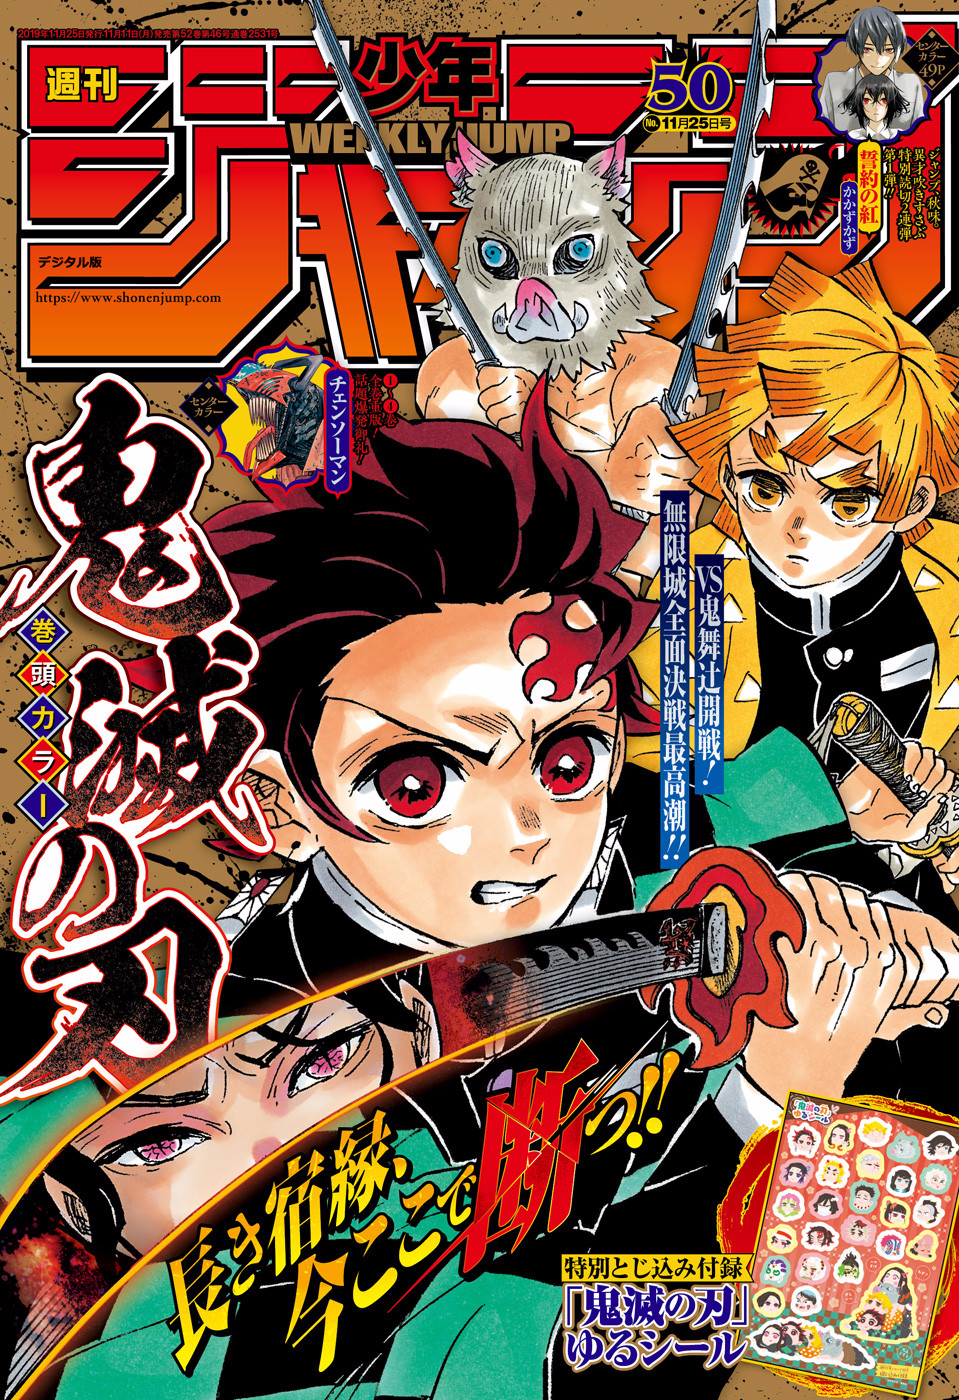 Kimetsu no Yaiba Digital Colored Comics Chapter 182